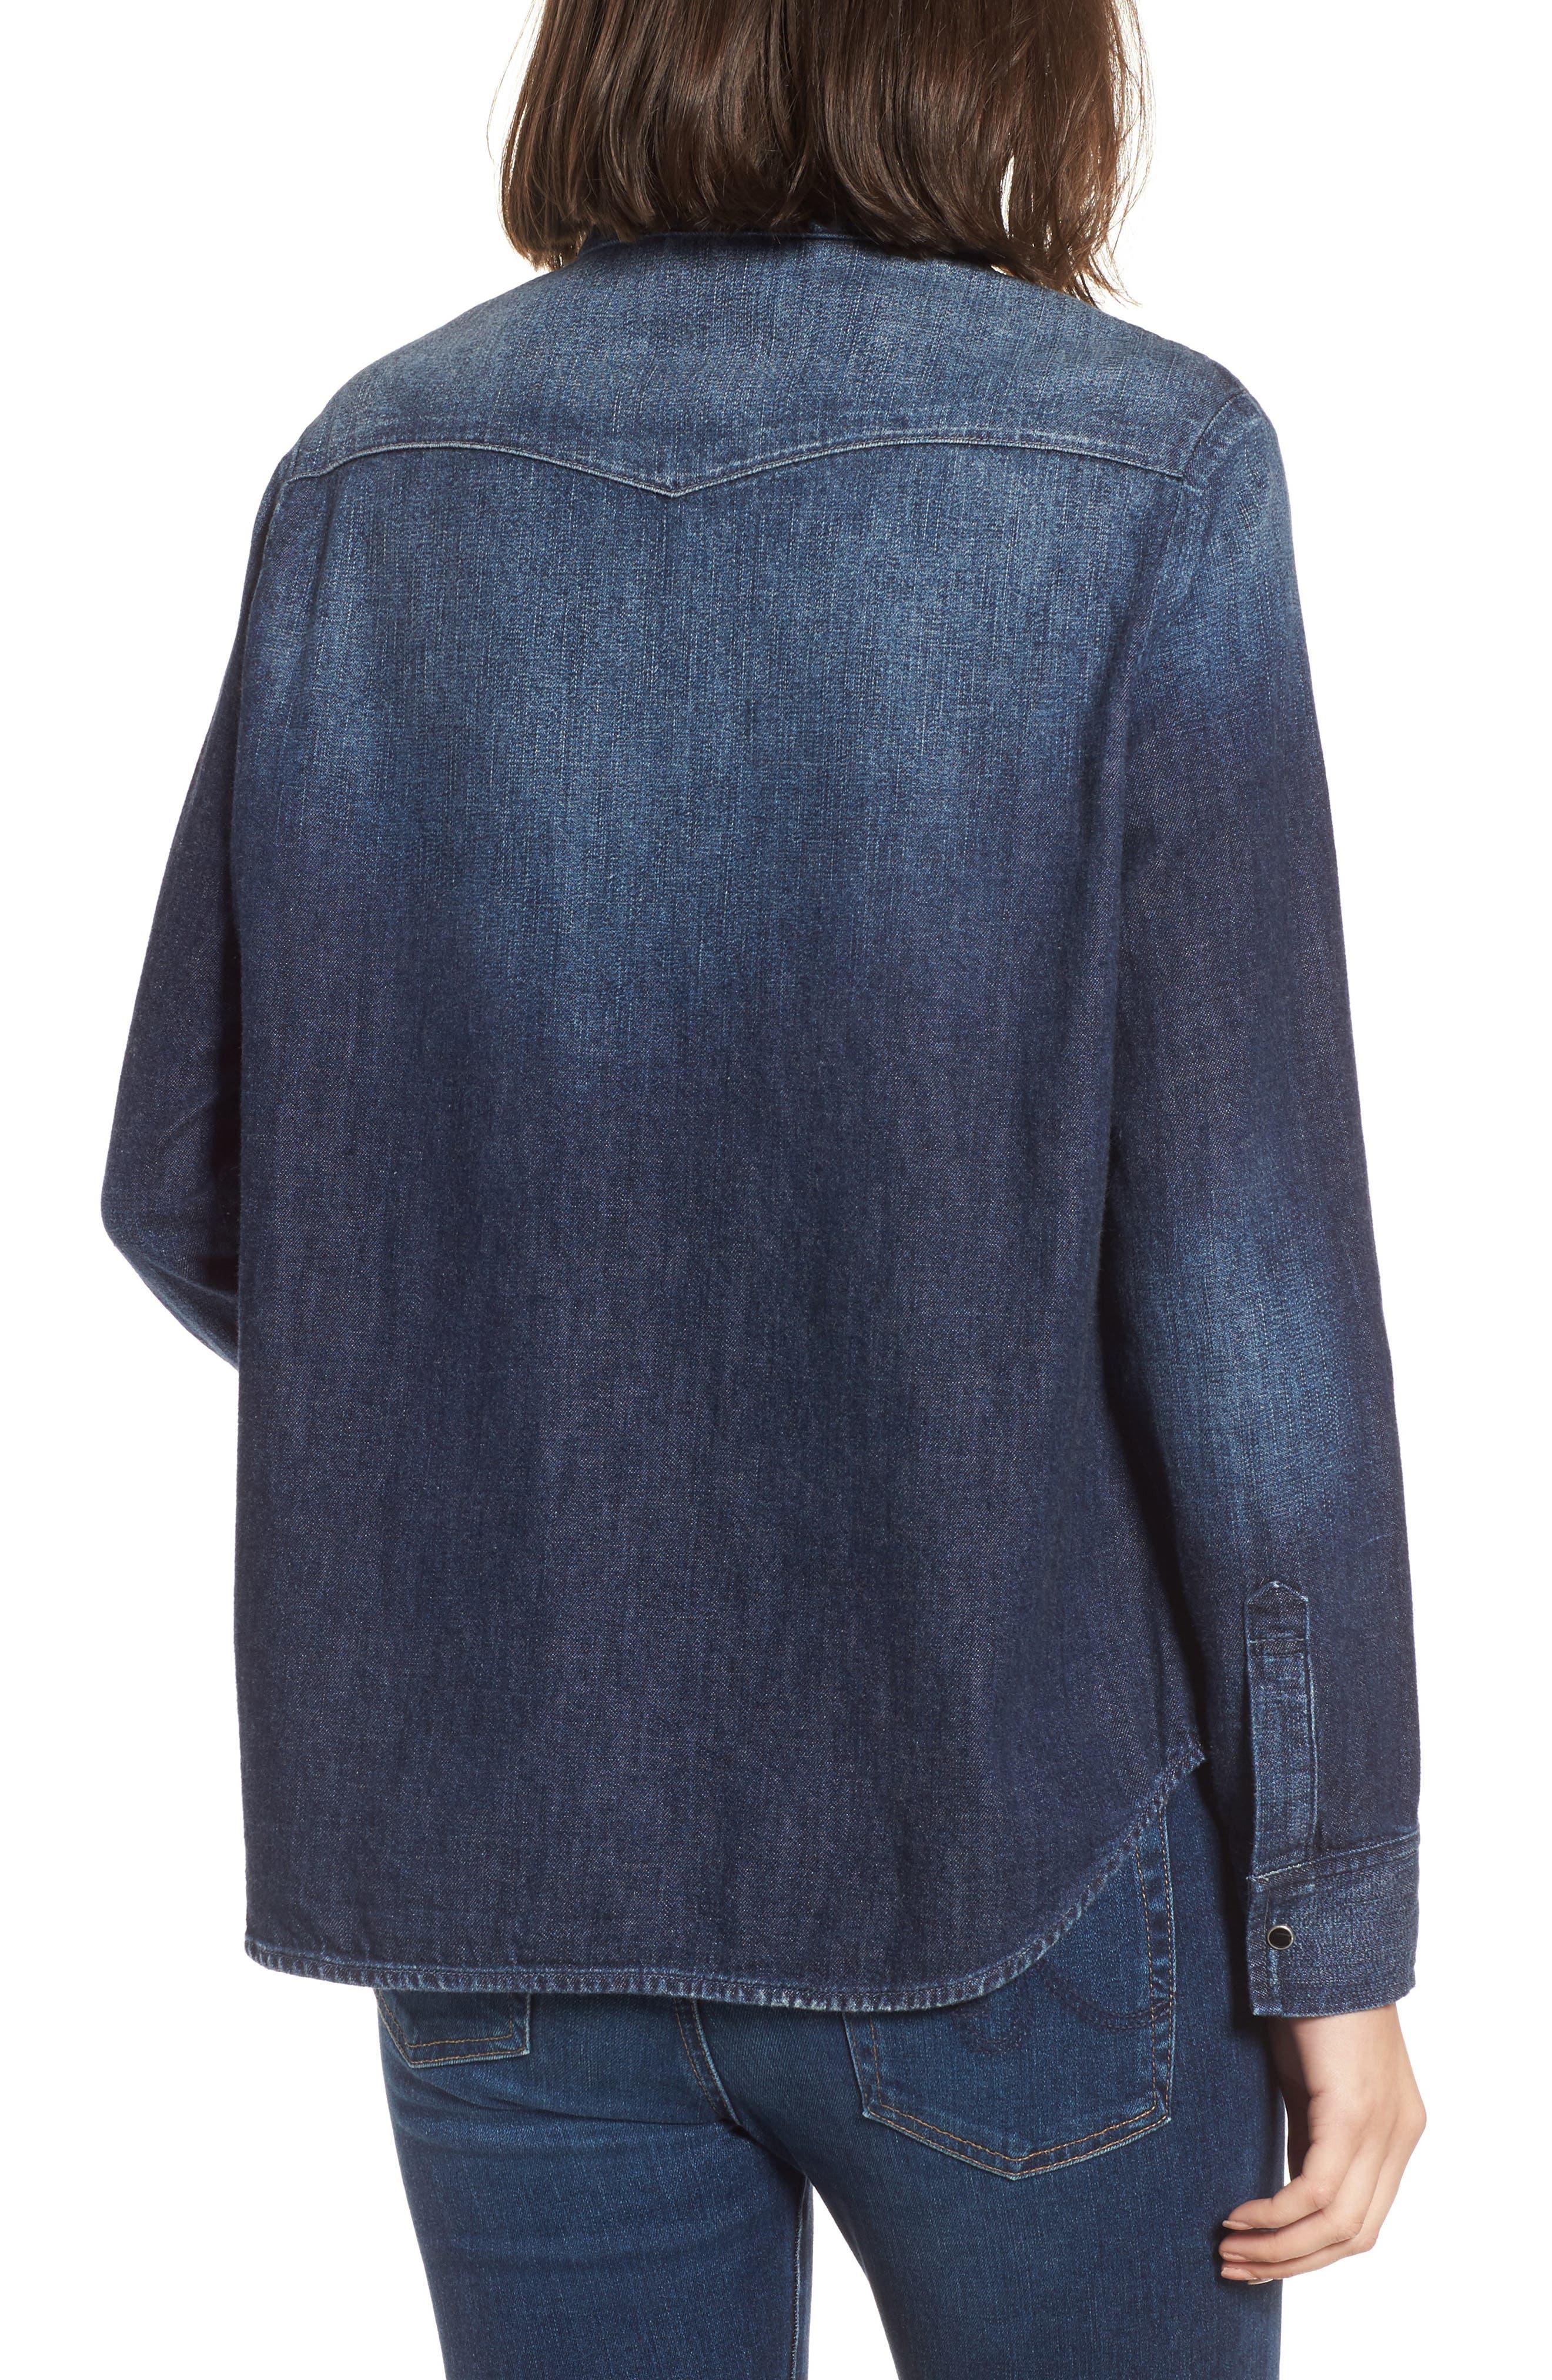 Deanna Denim Shirt,                             Alternate thumbnail 2, color,                             424